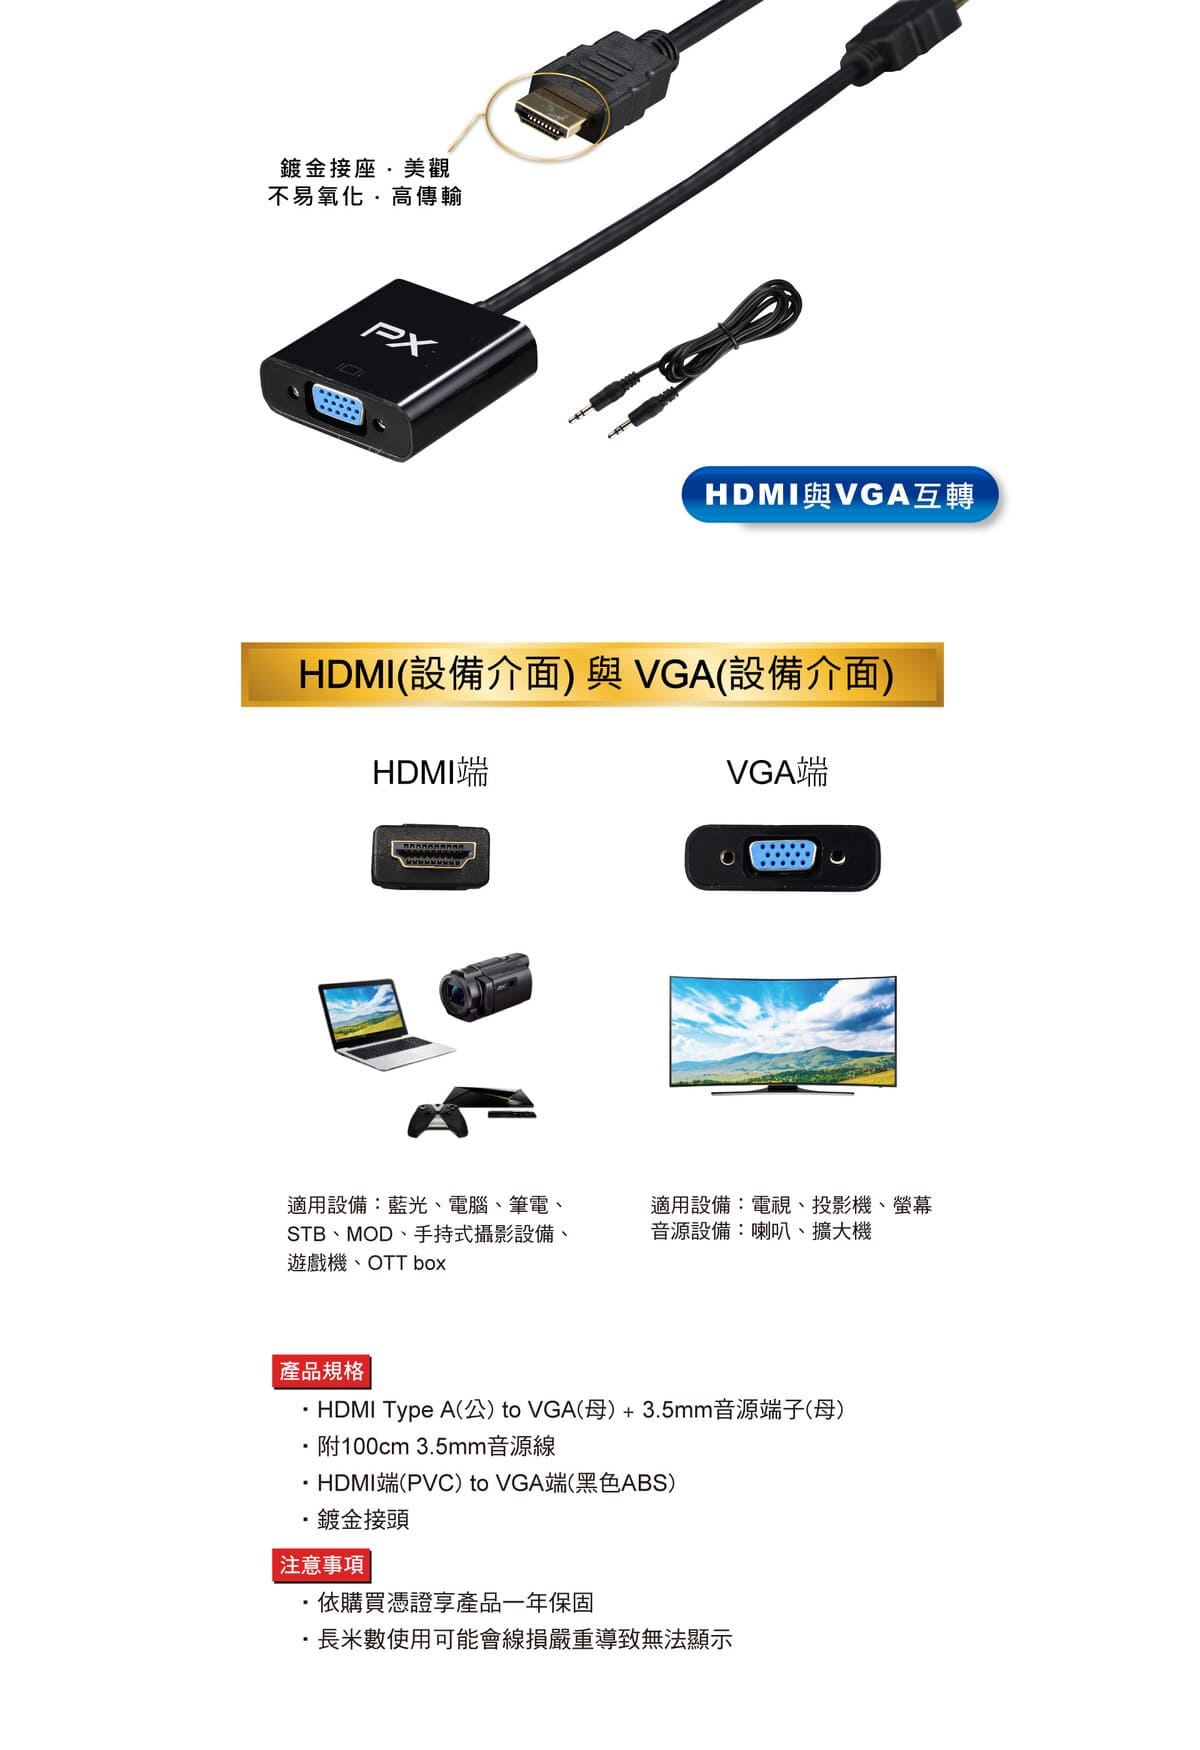 proimages/product/pro-02/pro06-007-轉接器/CA-104/CA-104-02.jpg